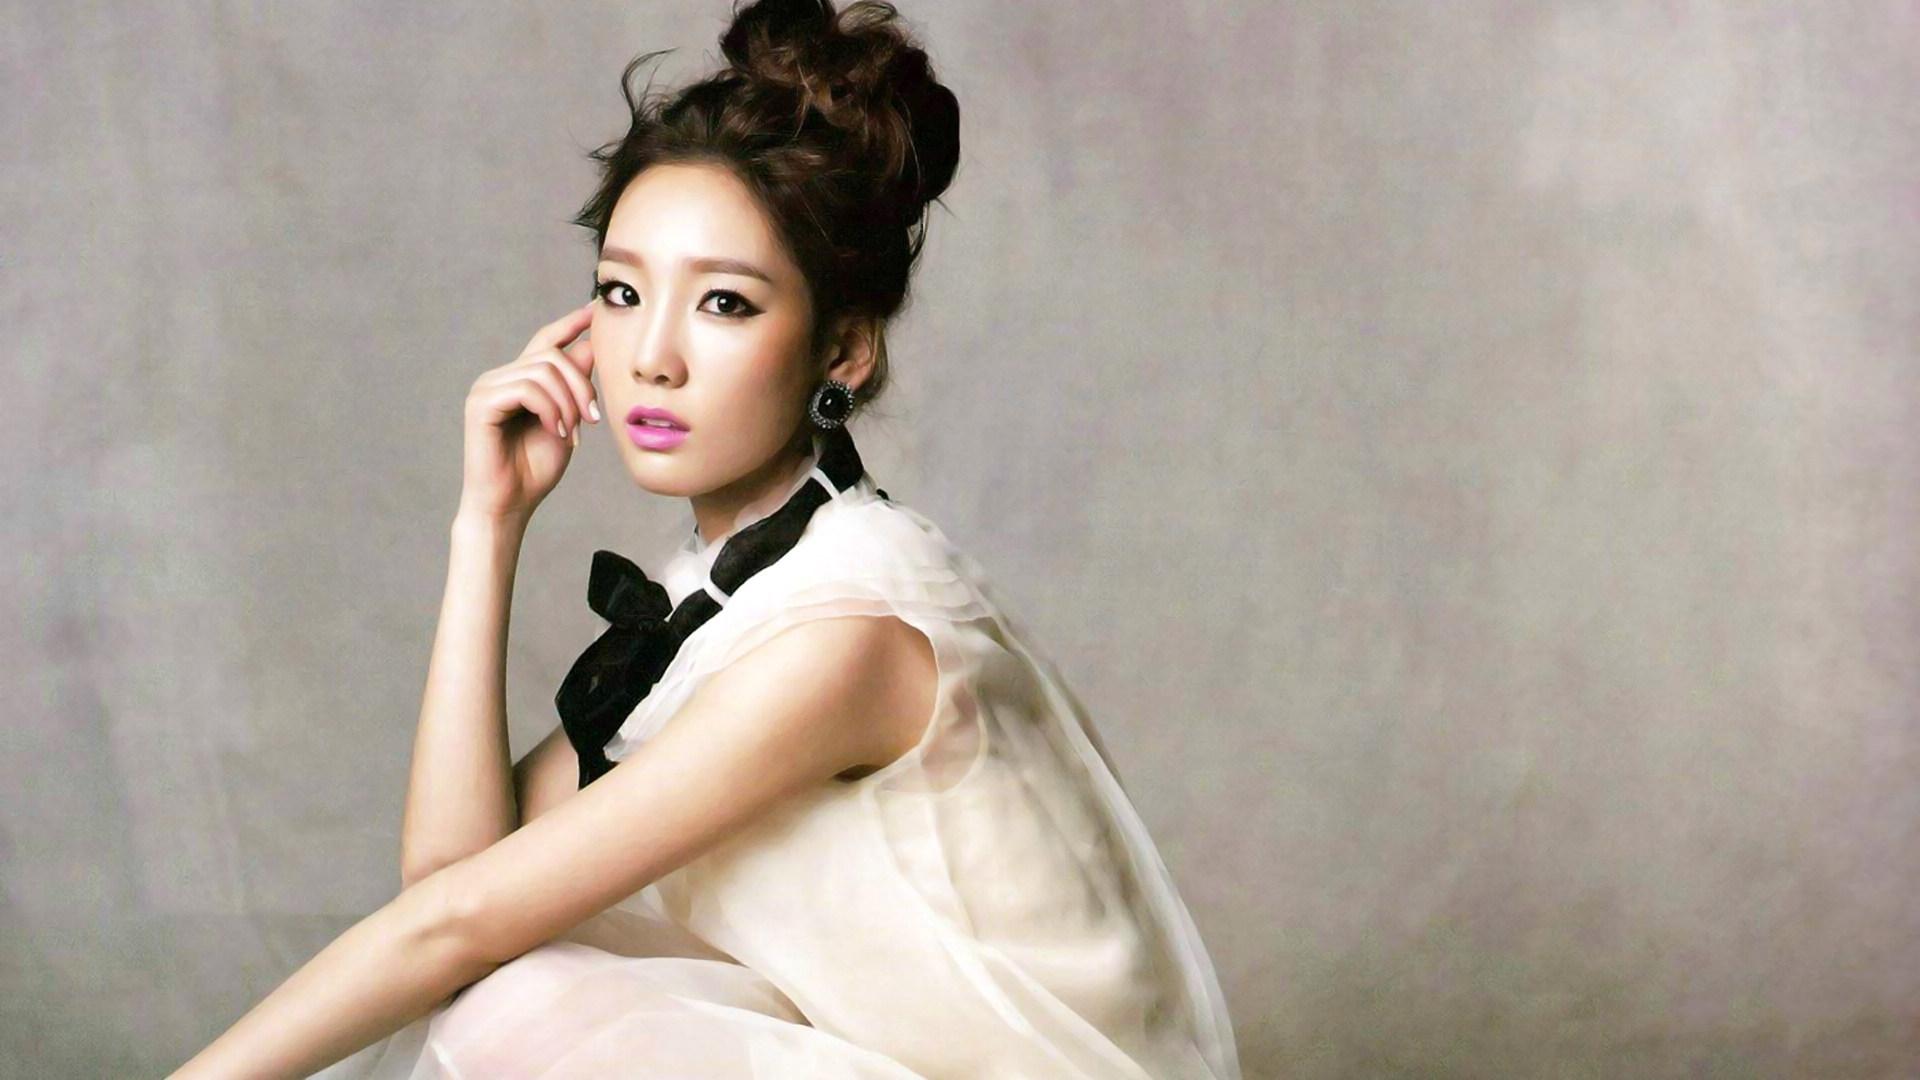 Seohyun Cute Wallpaper Taeyeon Snsd 2013 N Wallpaper 1920x1080 98277